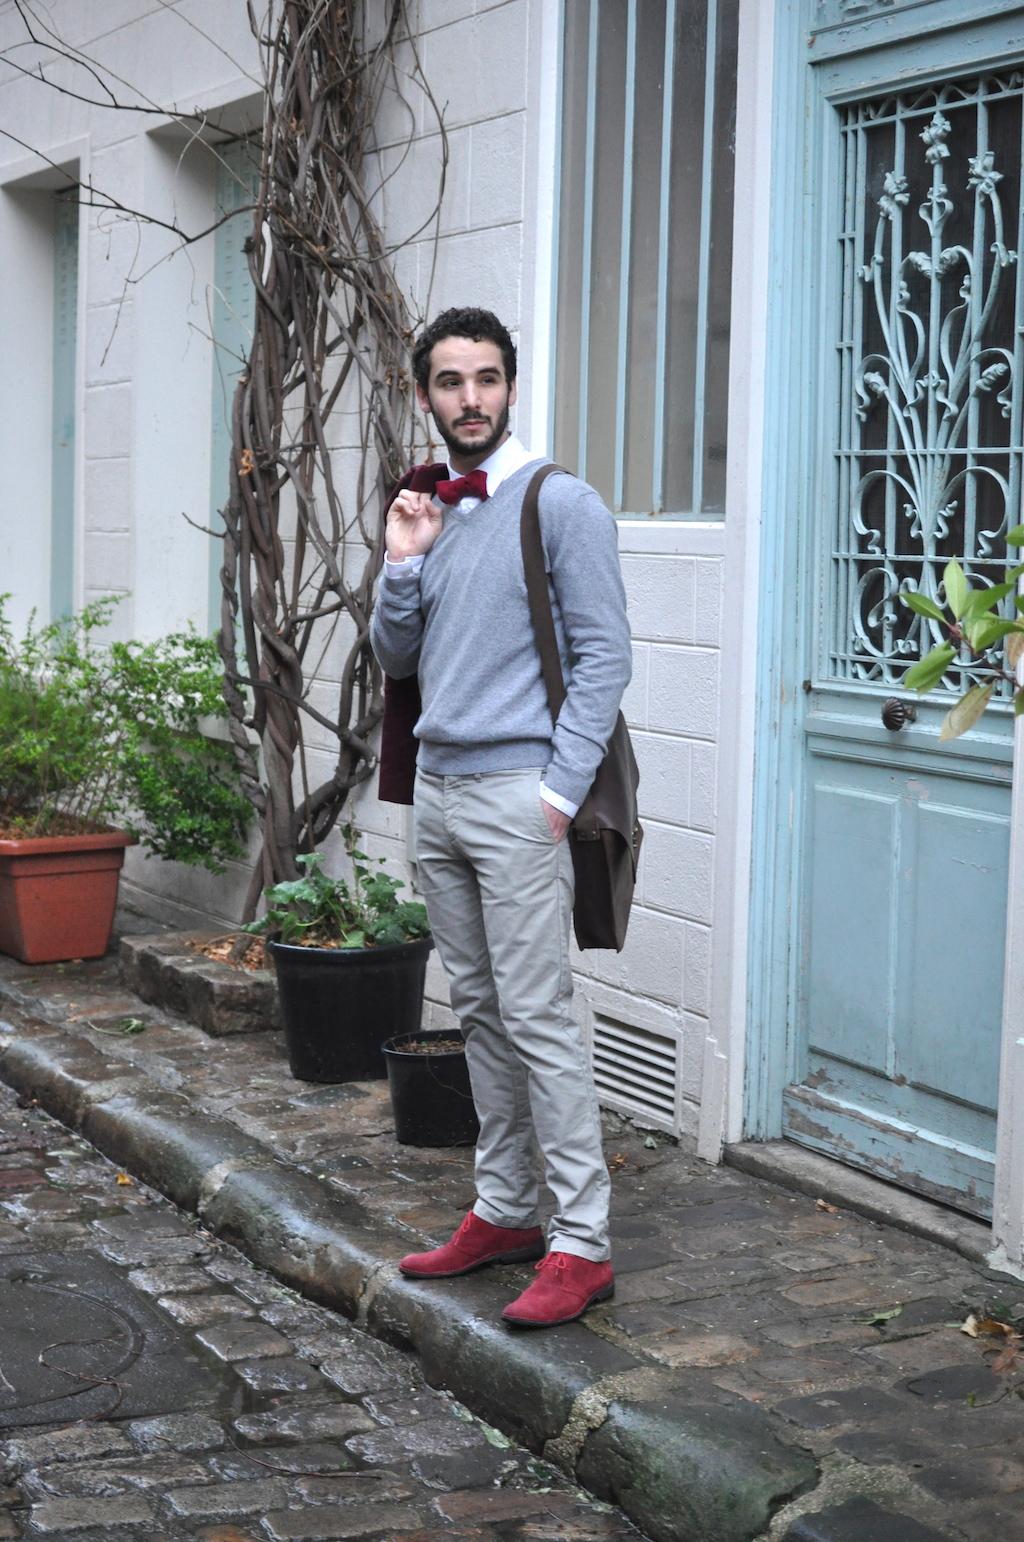 blog mode homme leblogdemonsieur tailor4less brice carhartt parisyorker derigueur